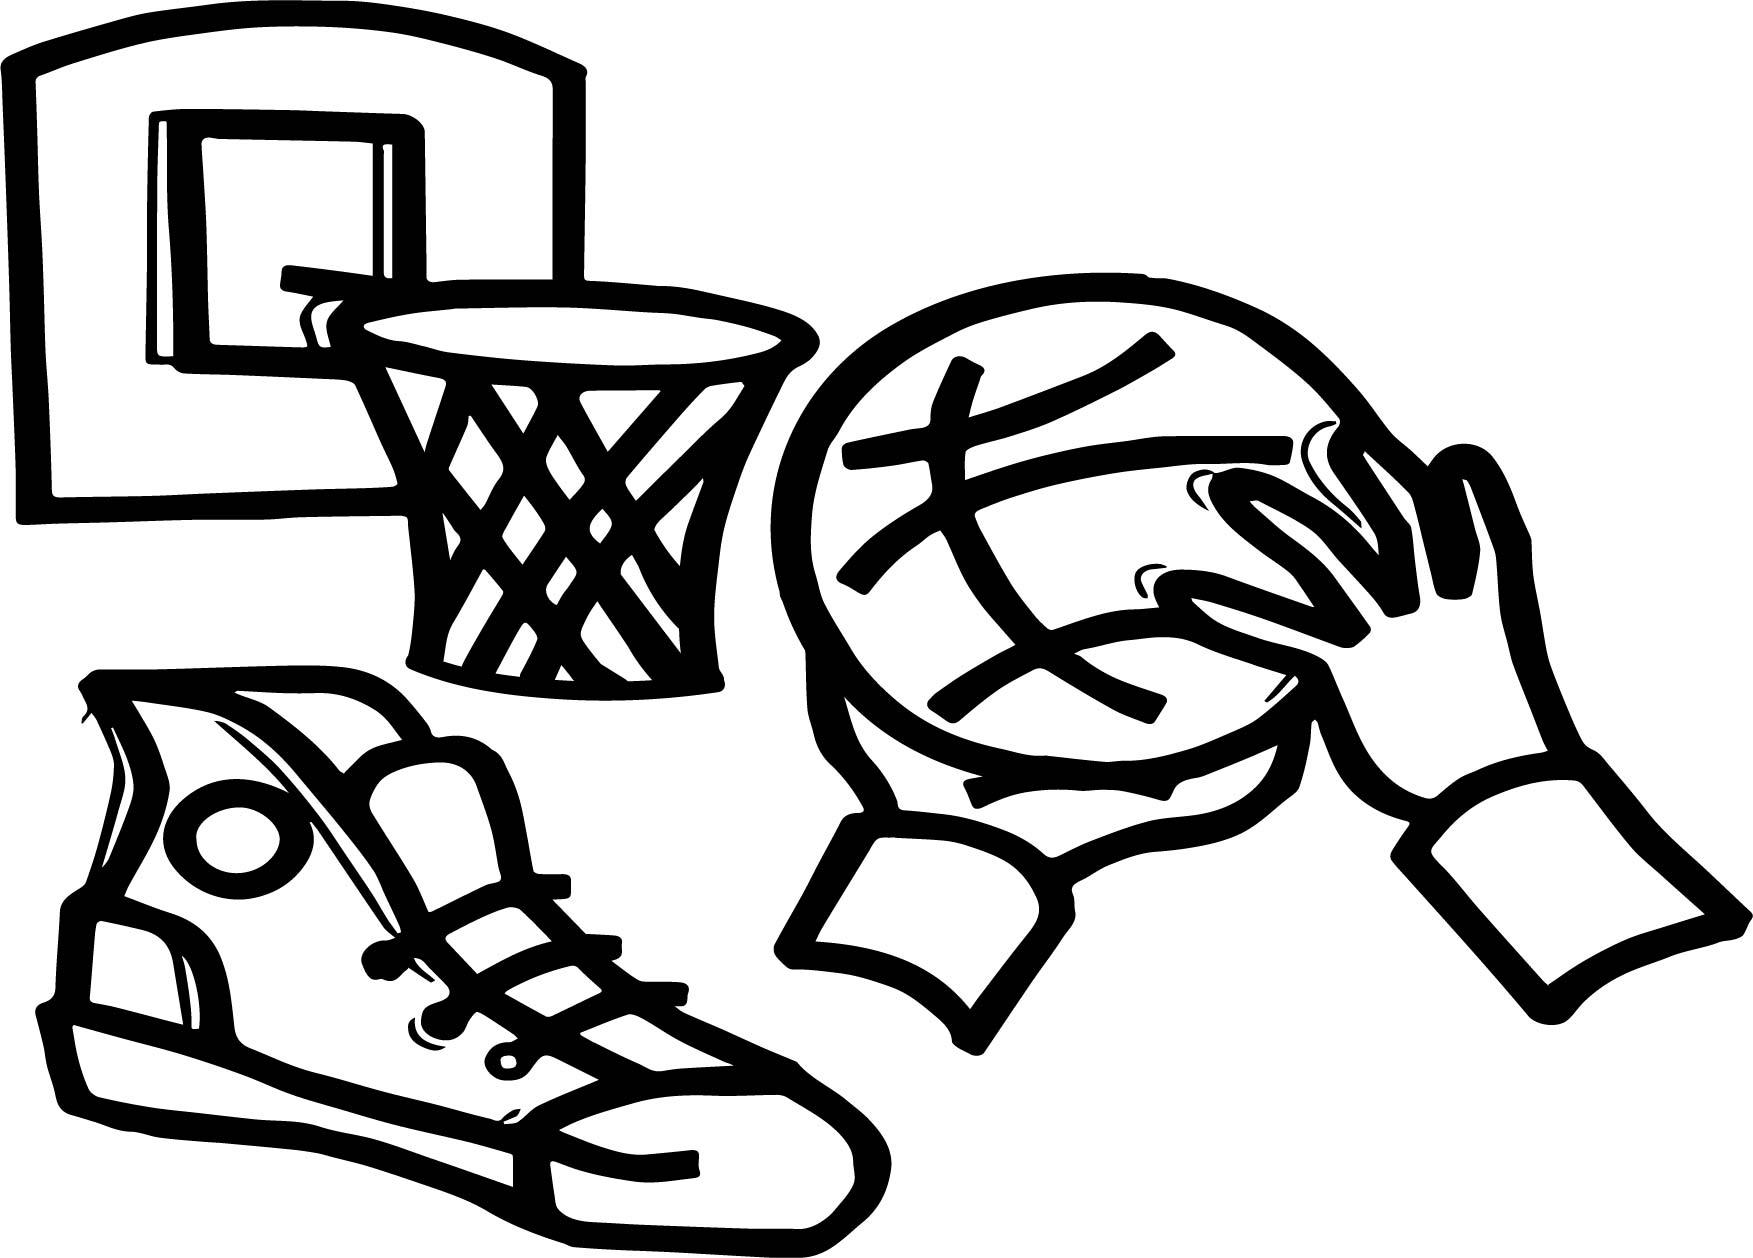 Playing Basketball Basket Hand Ball Coloring Page